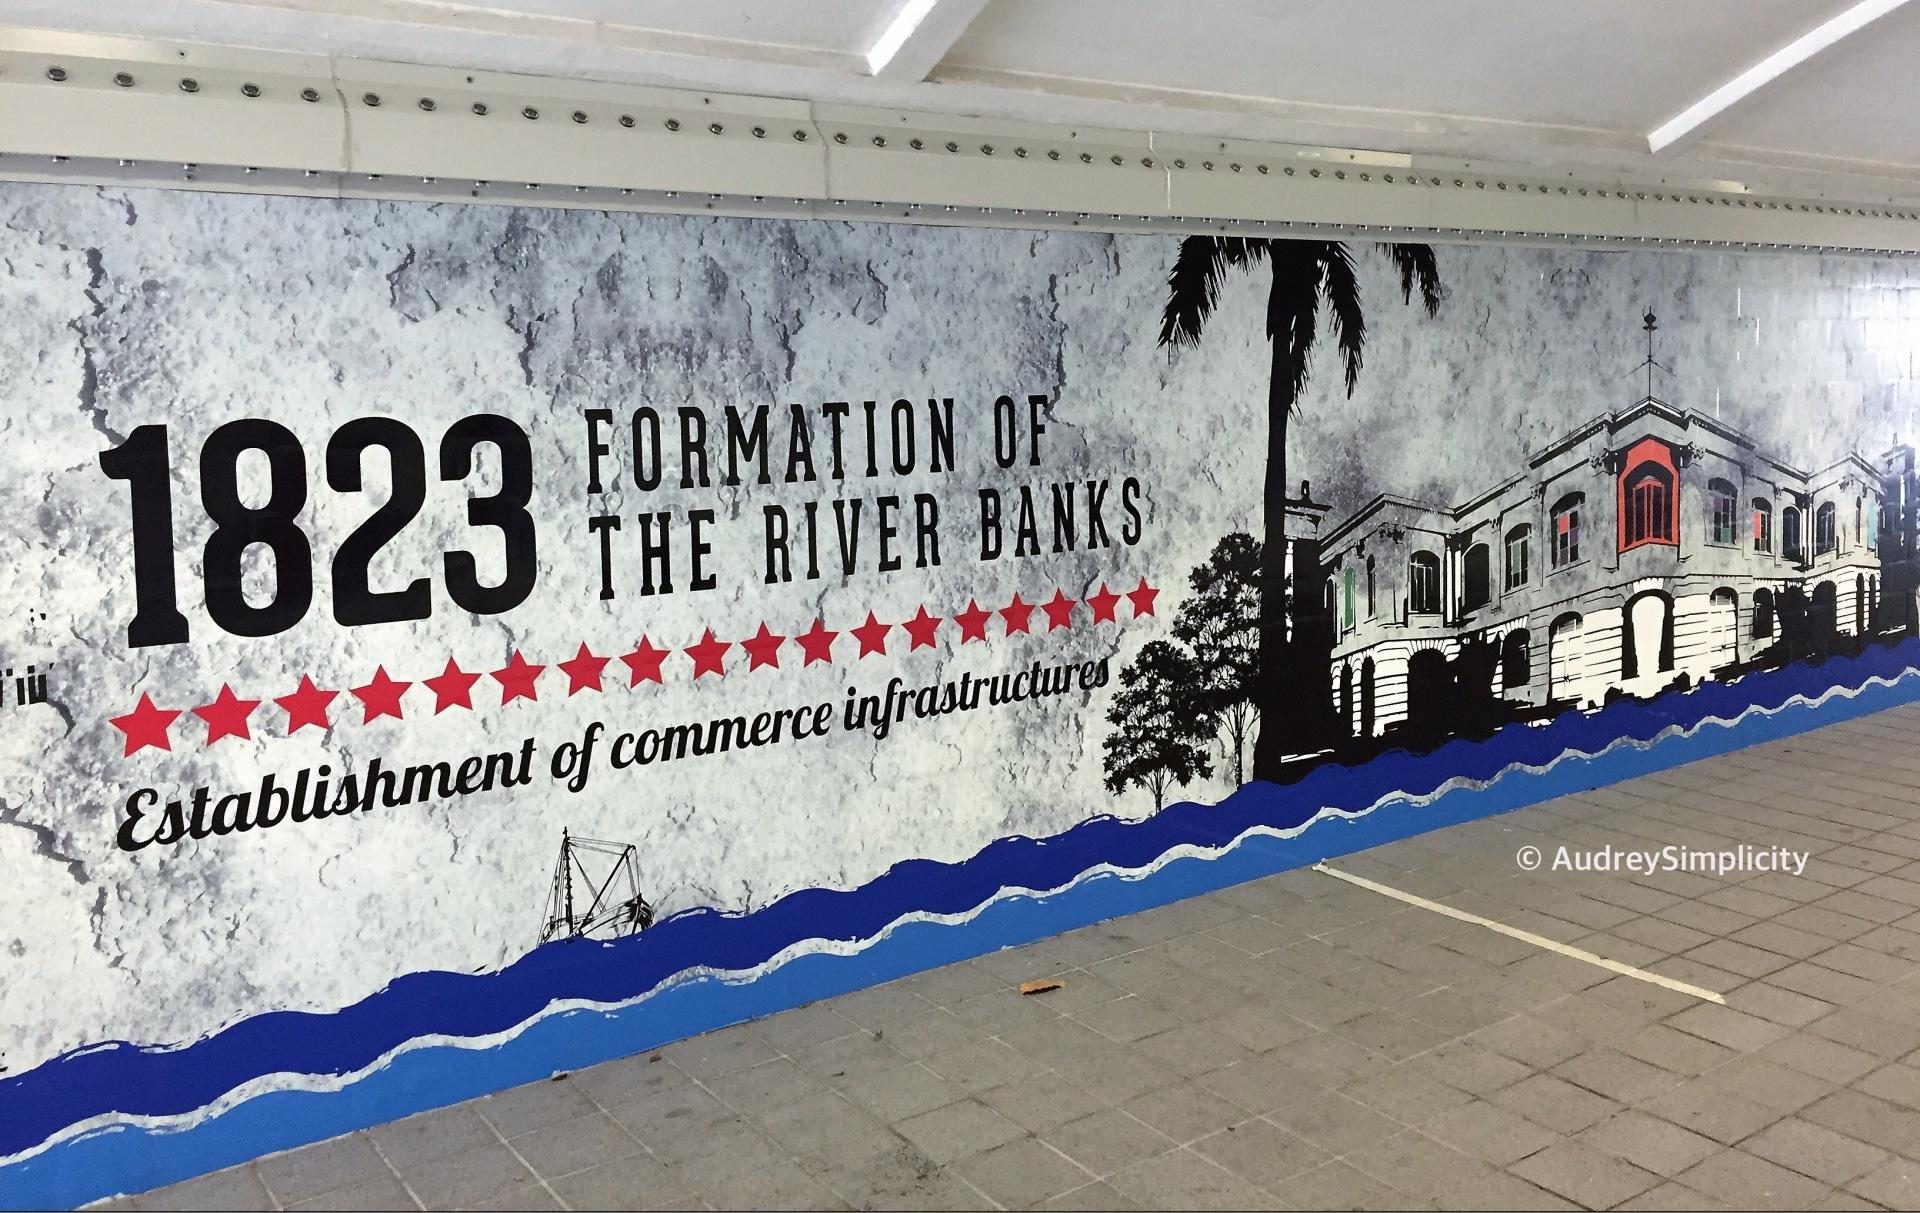 1823 Establishment of commerce infrastructure